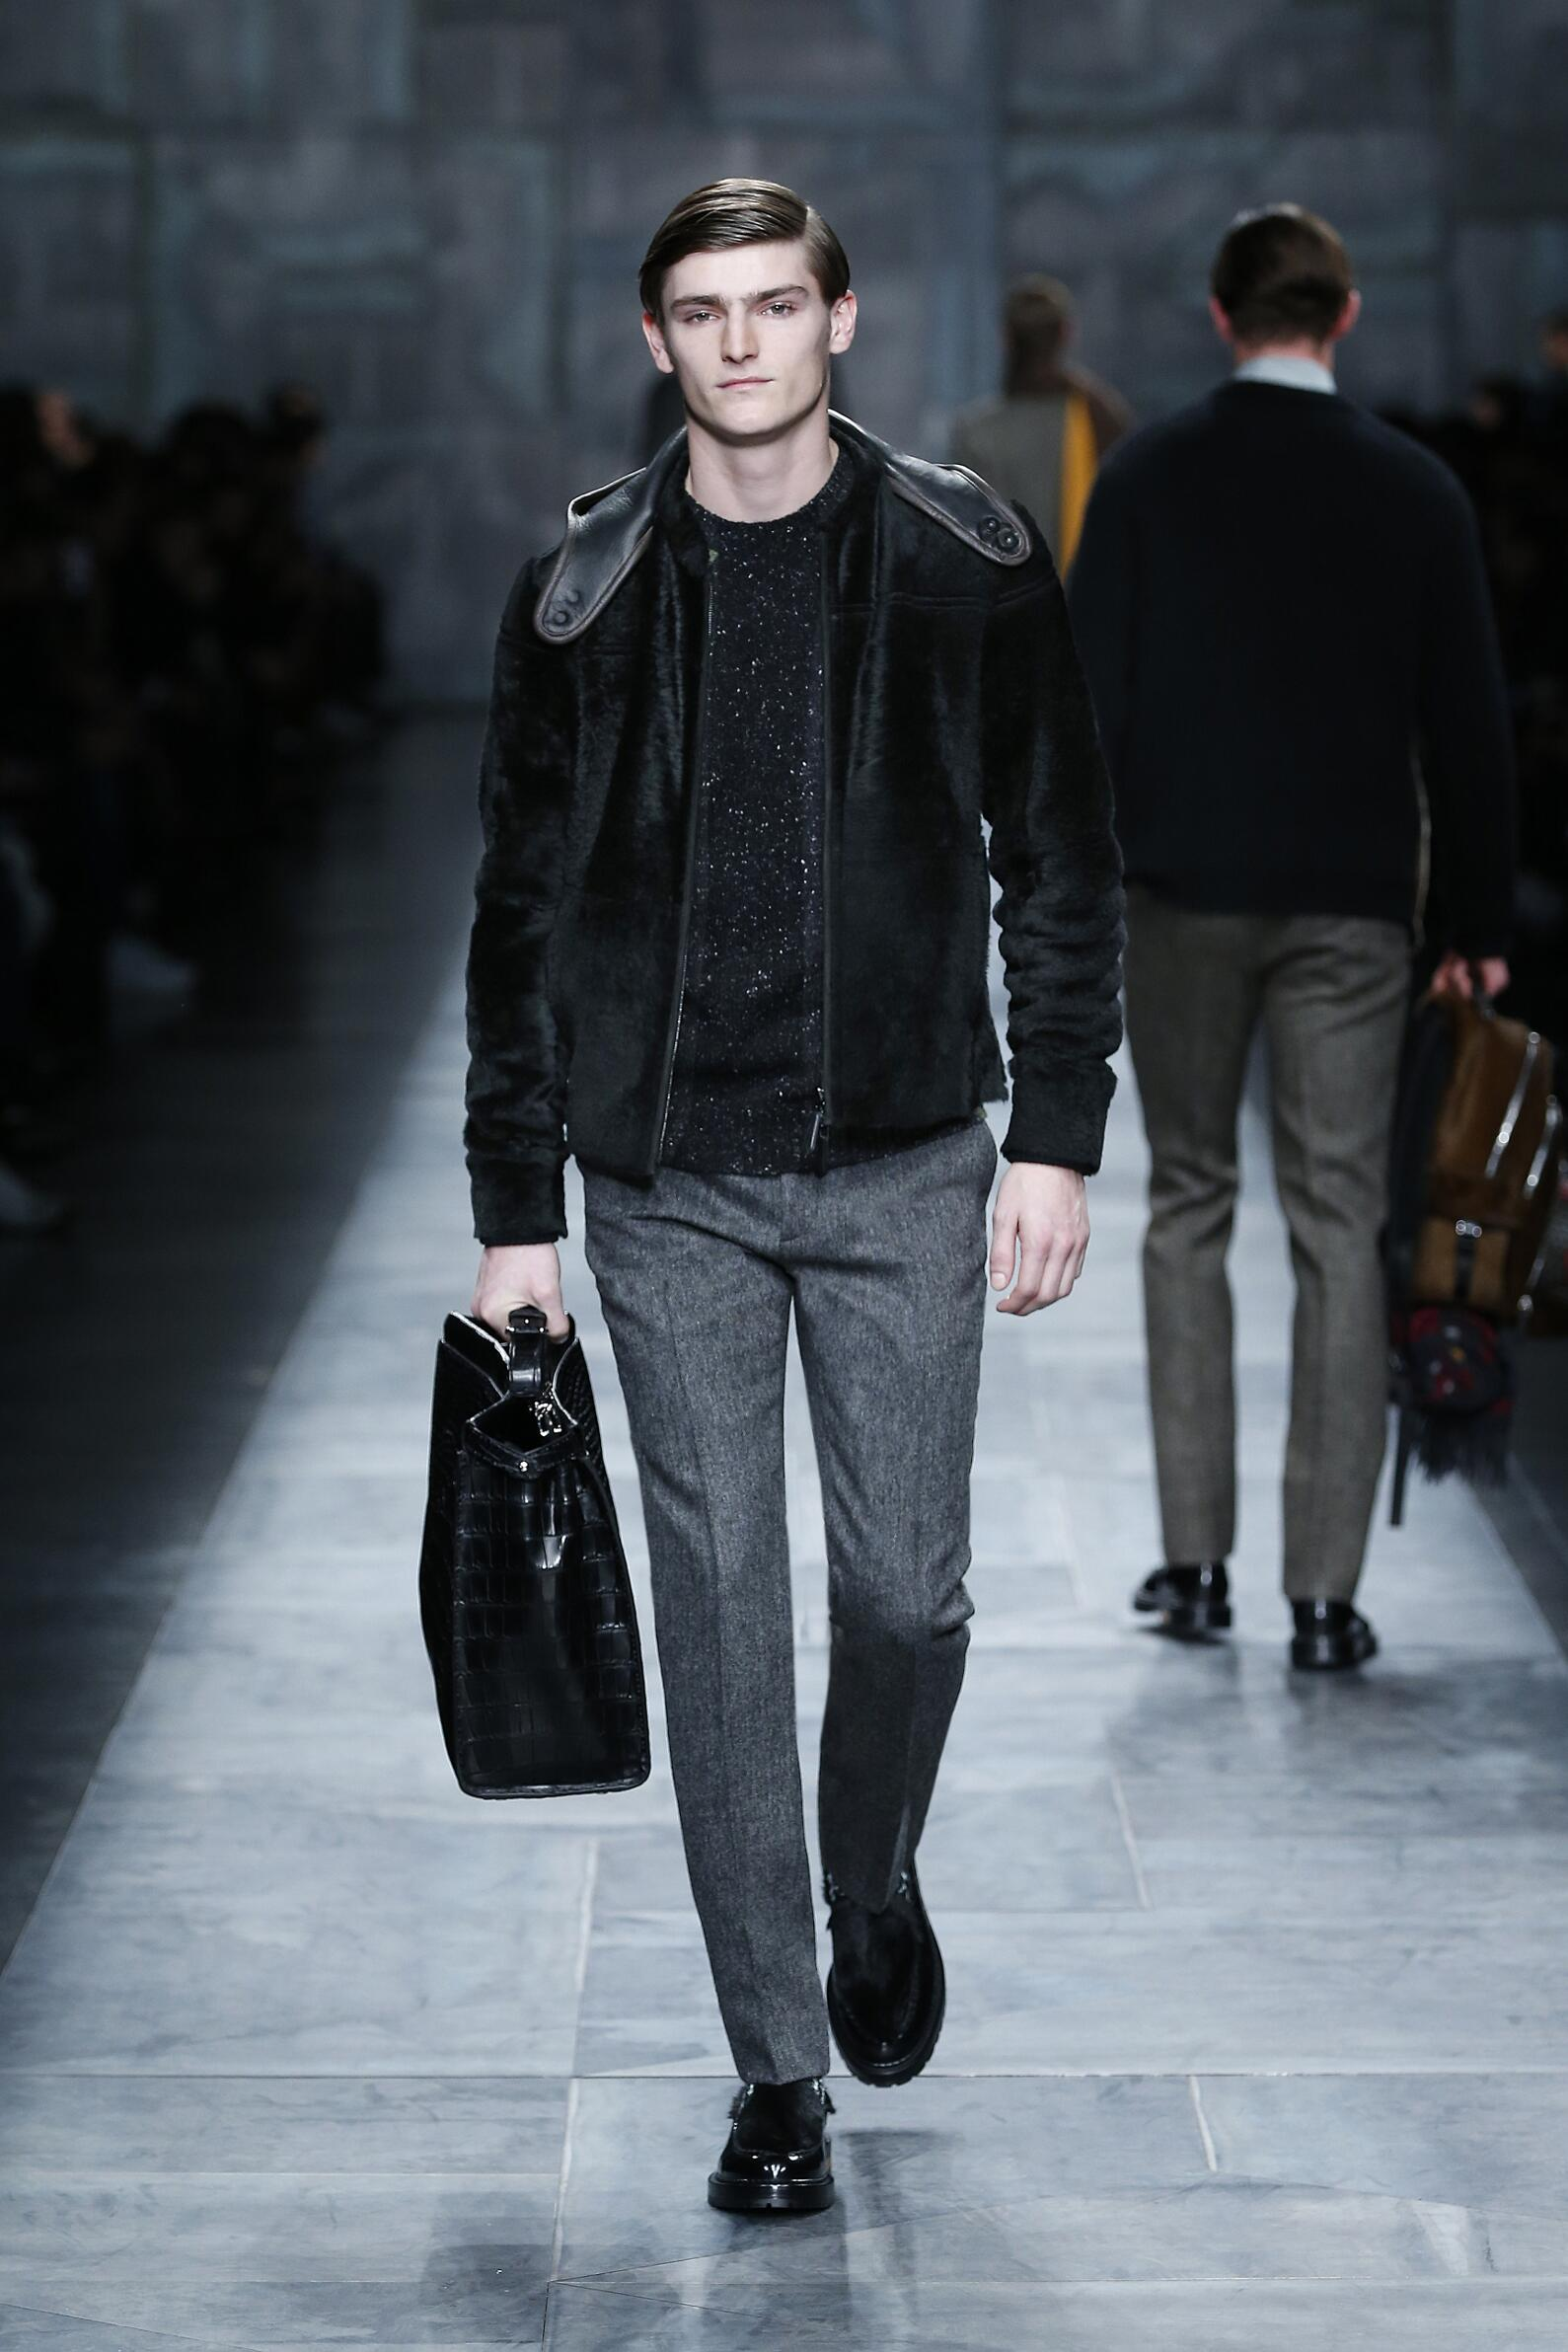 765dcc0c8a Runway Fendi Fall Winter 2015 16 Men s Collection Milan Fashion Week